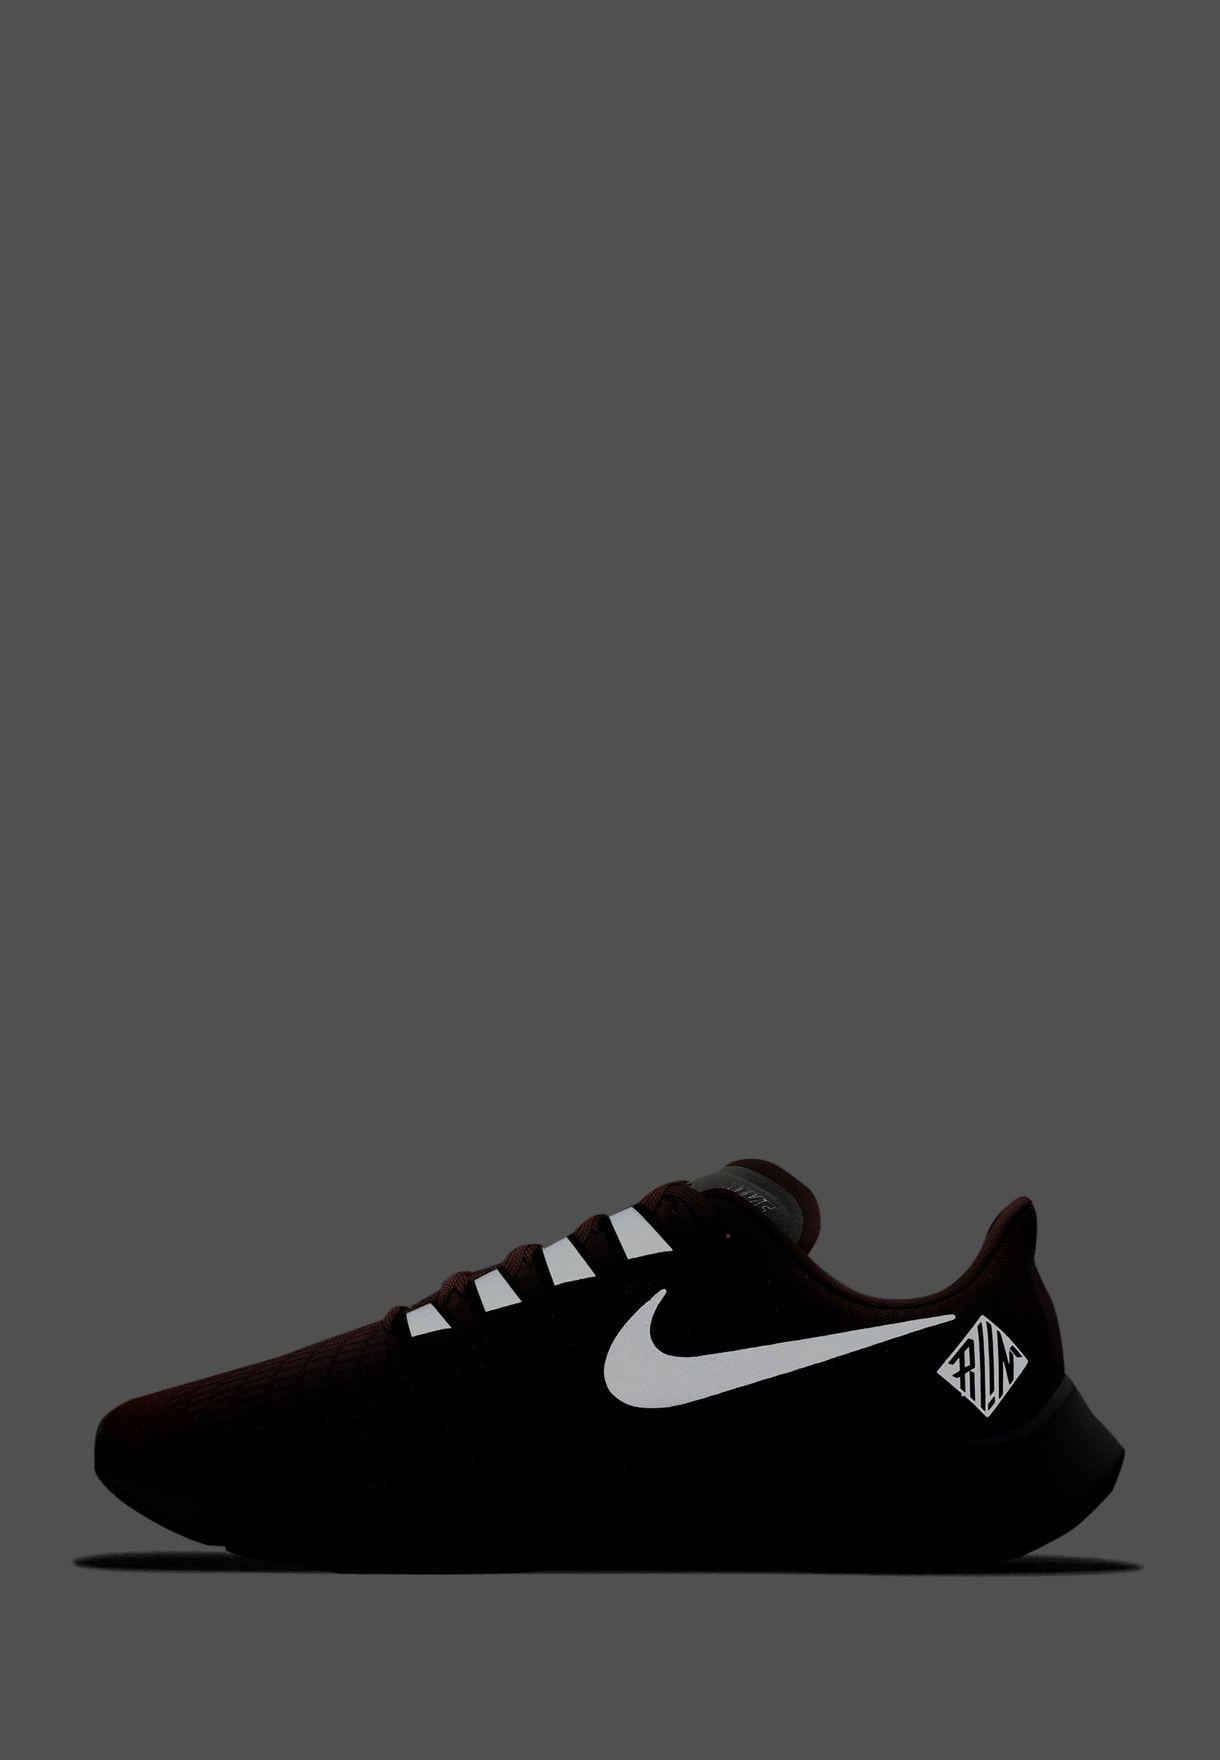 حذاء اير زووم بيجاسوس 37 جل